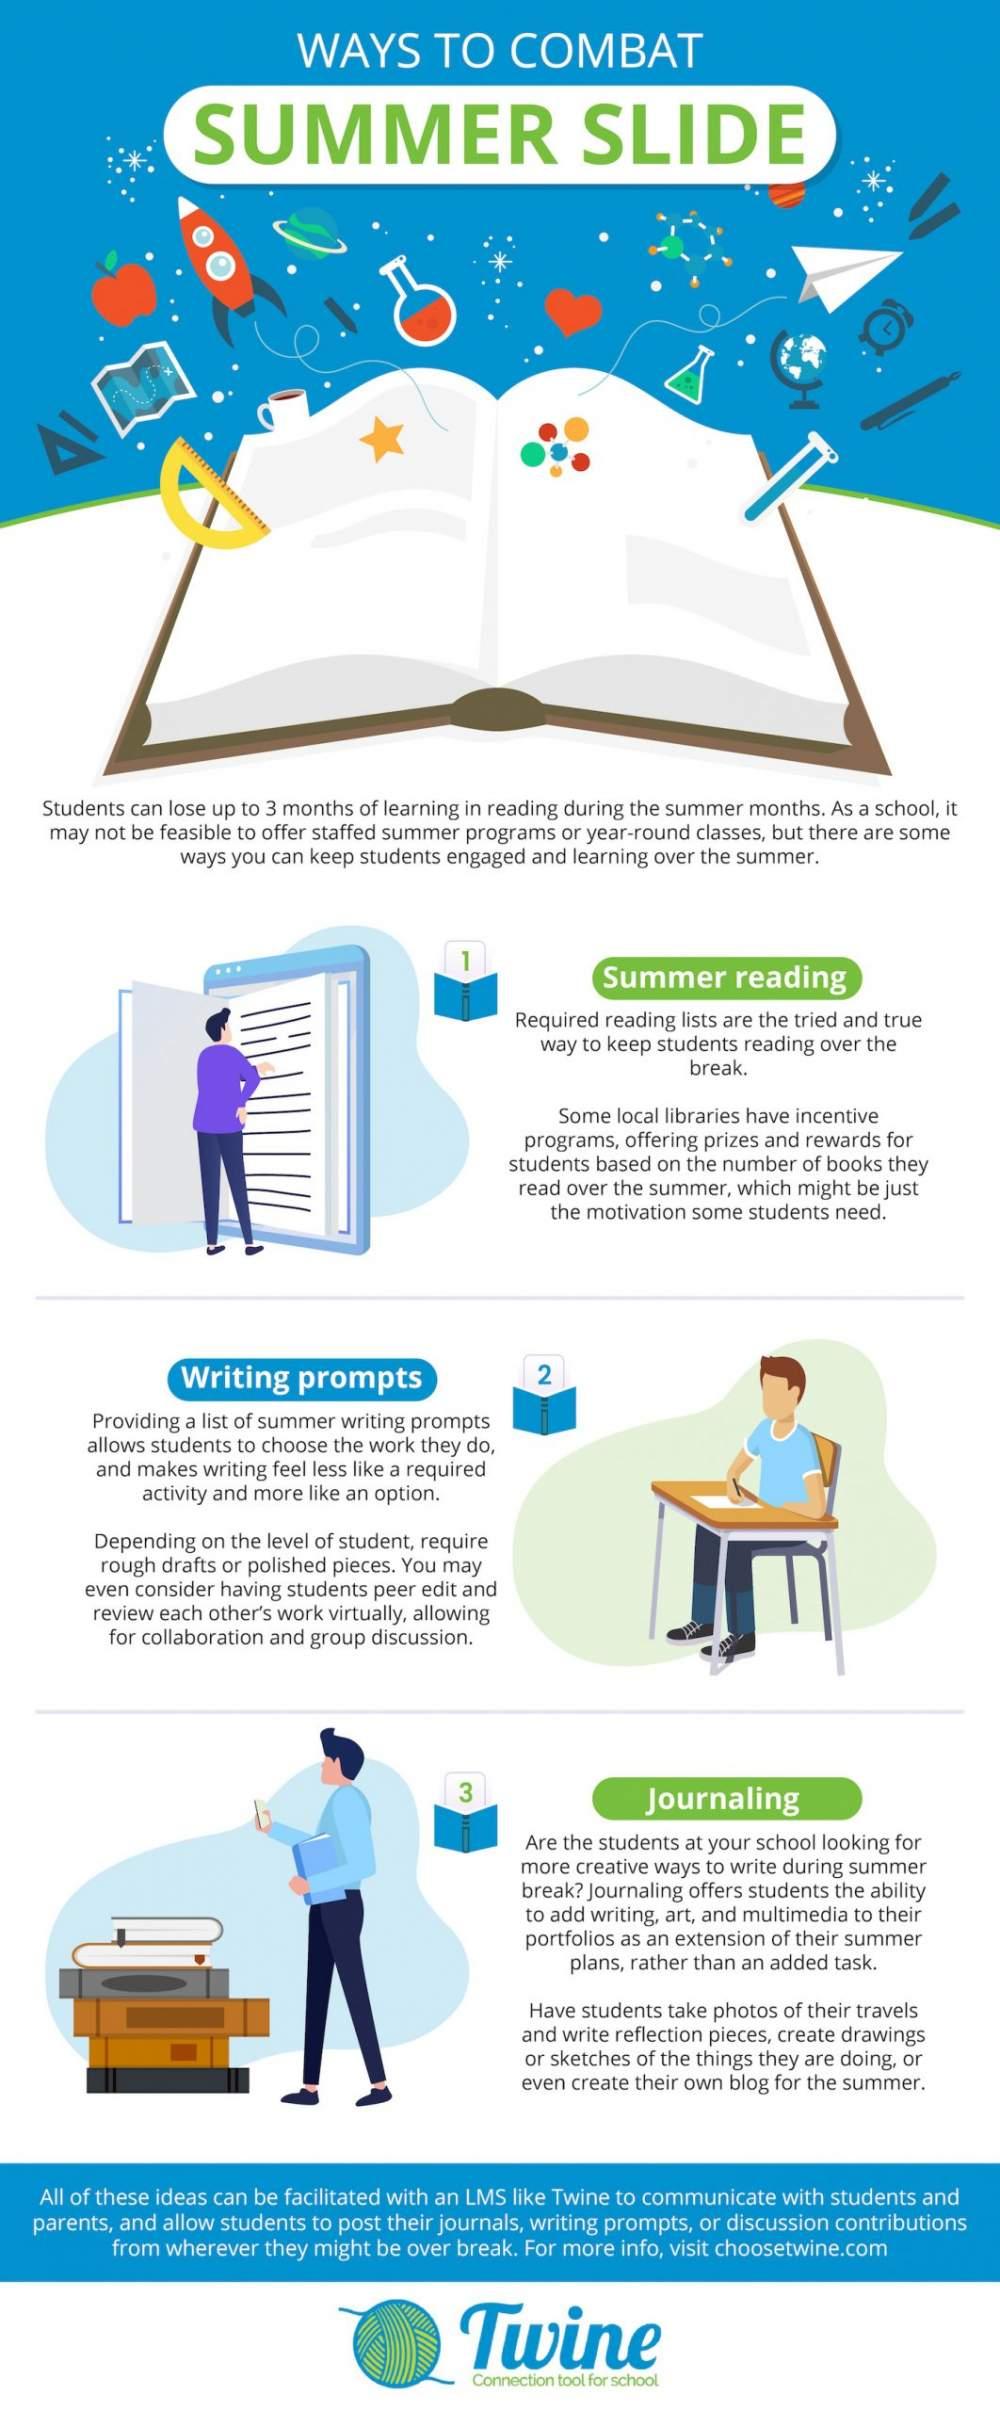 Ways to combat summer slide in reading